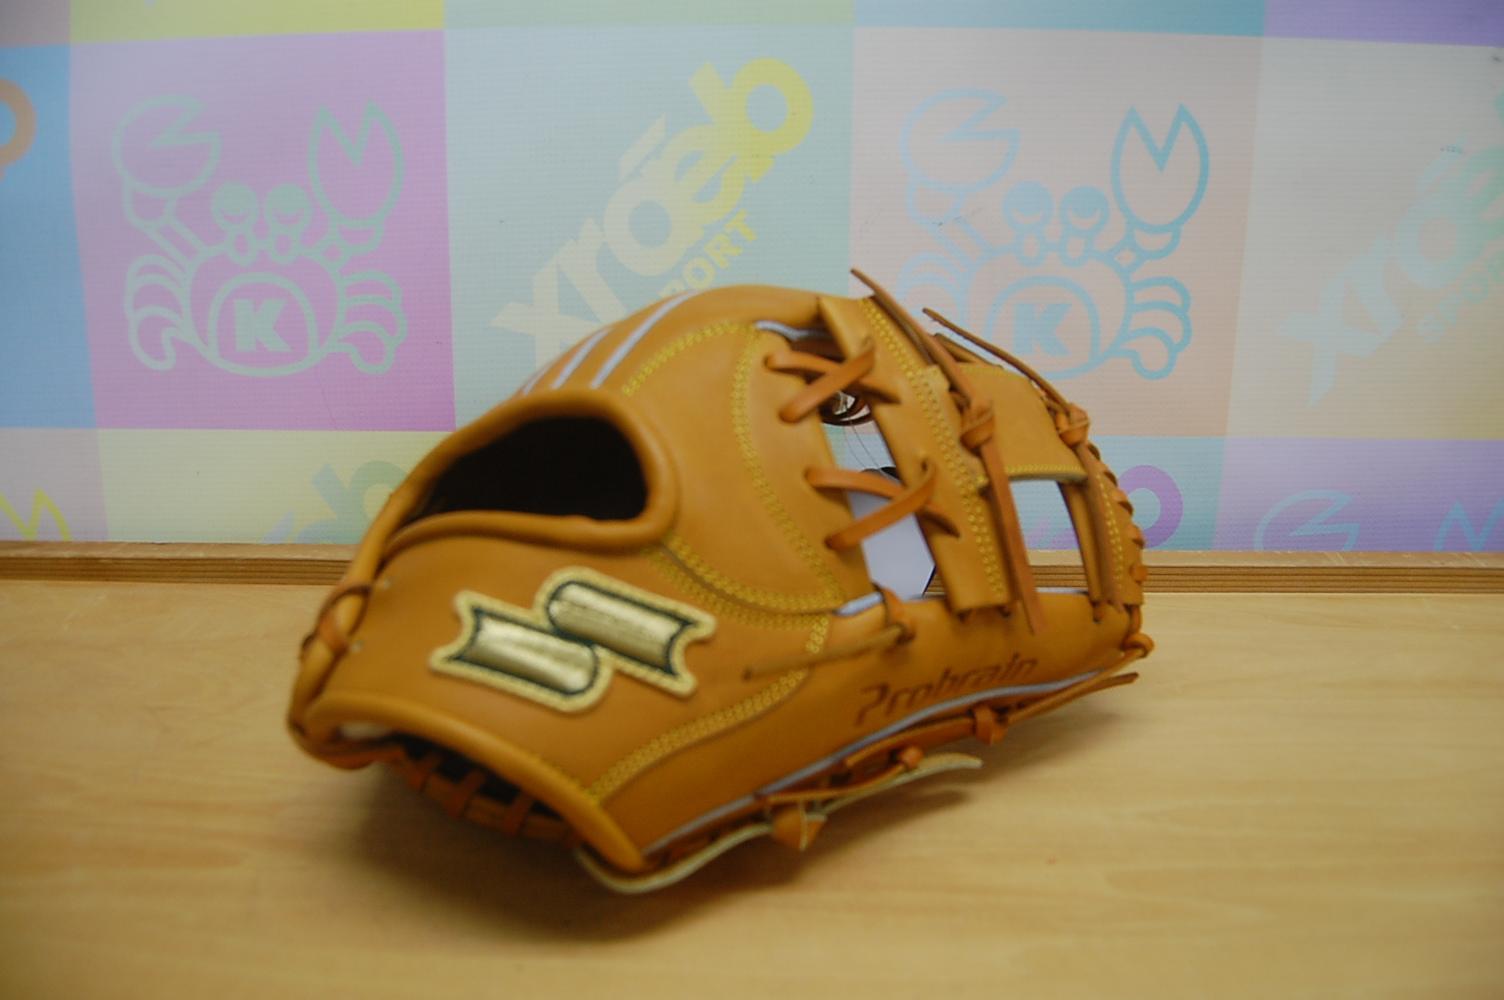 【SALE】SSK 硬式グラブ 内野手用 プロブレイン 硬式野球 高校野球 硬式グローブ エスエスケイ PHX76